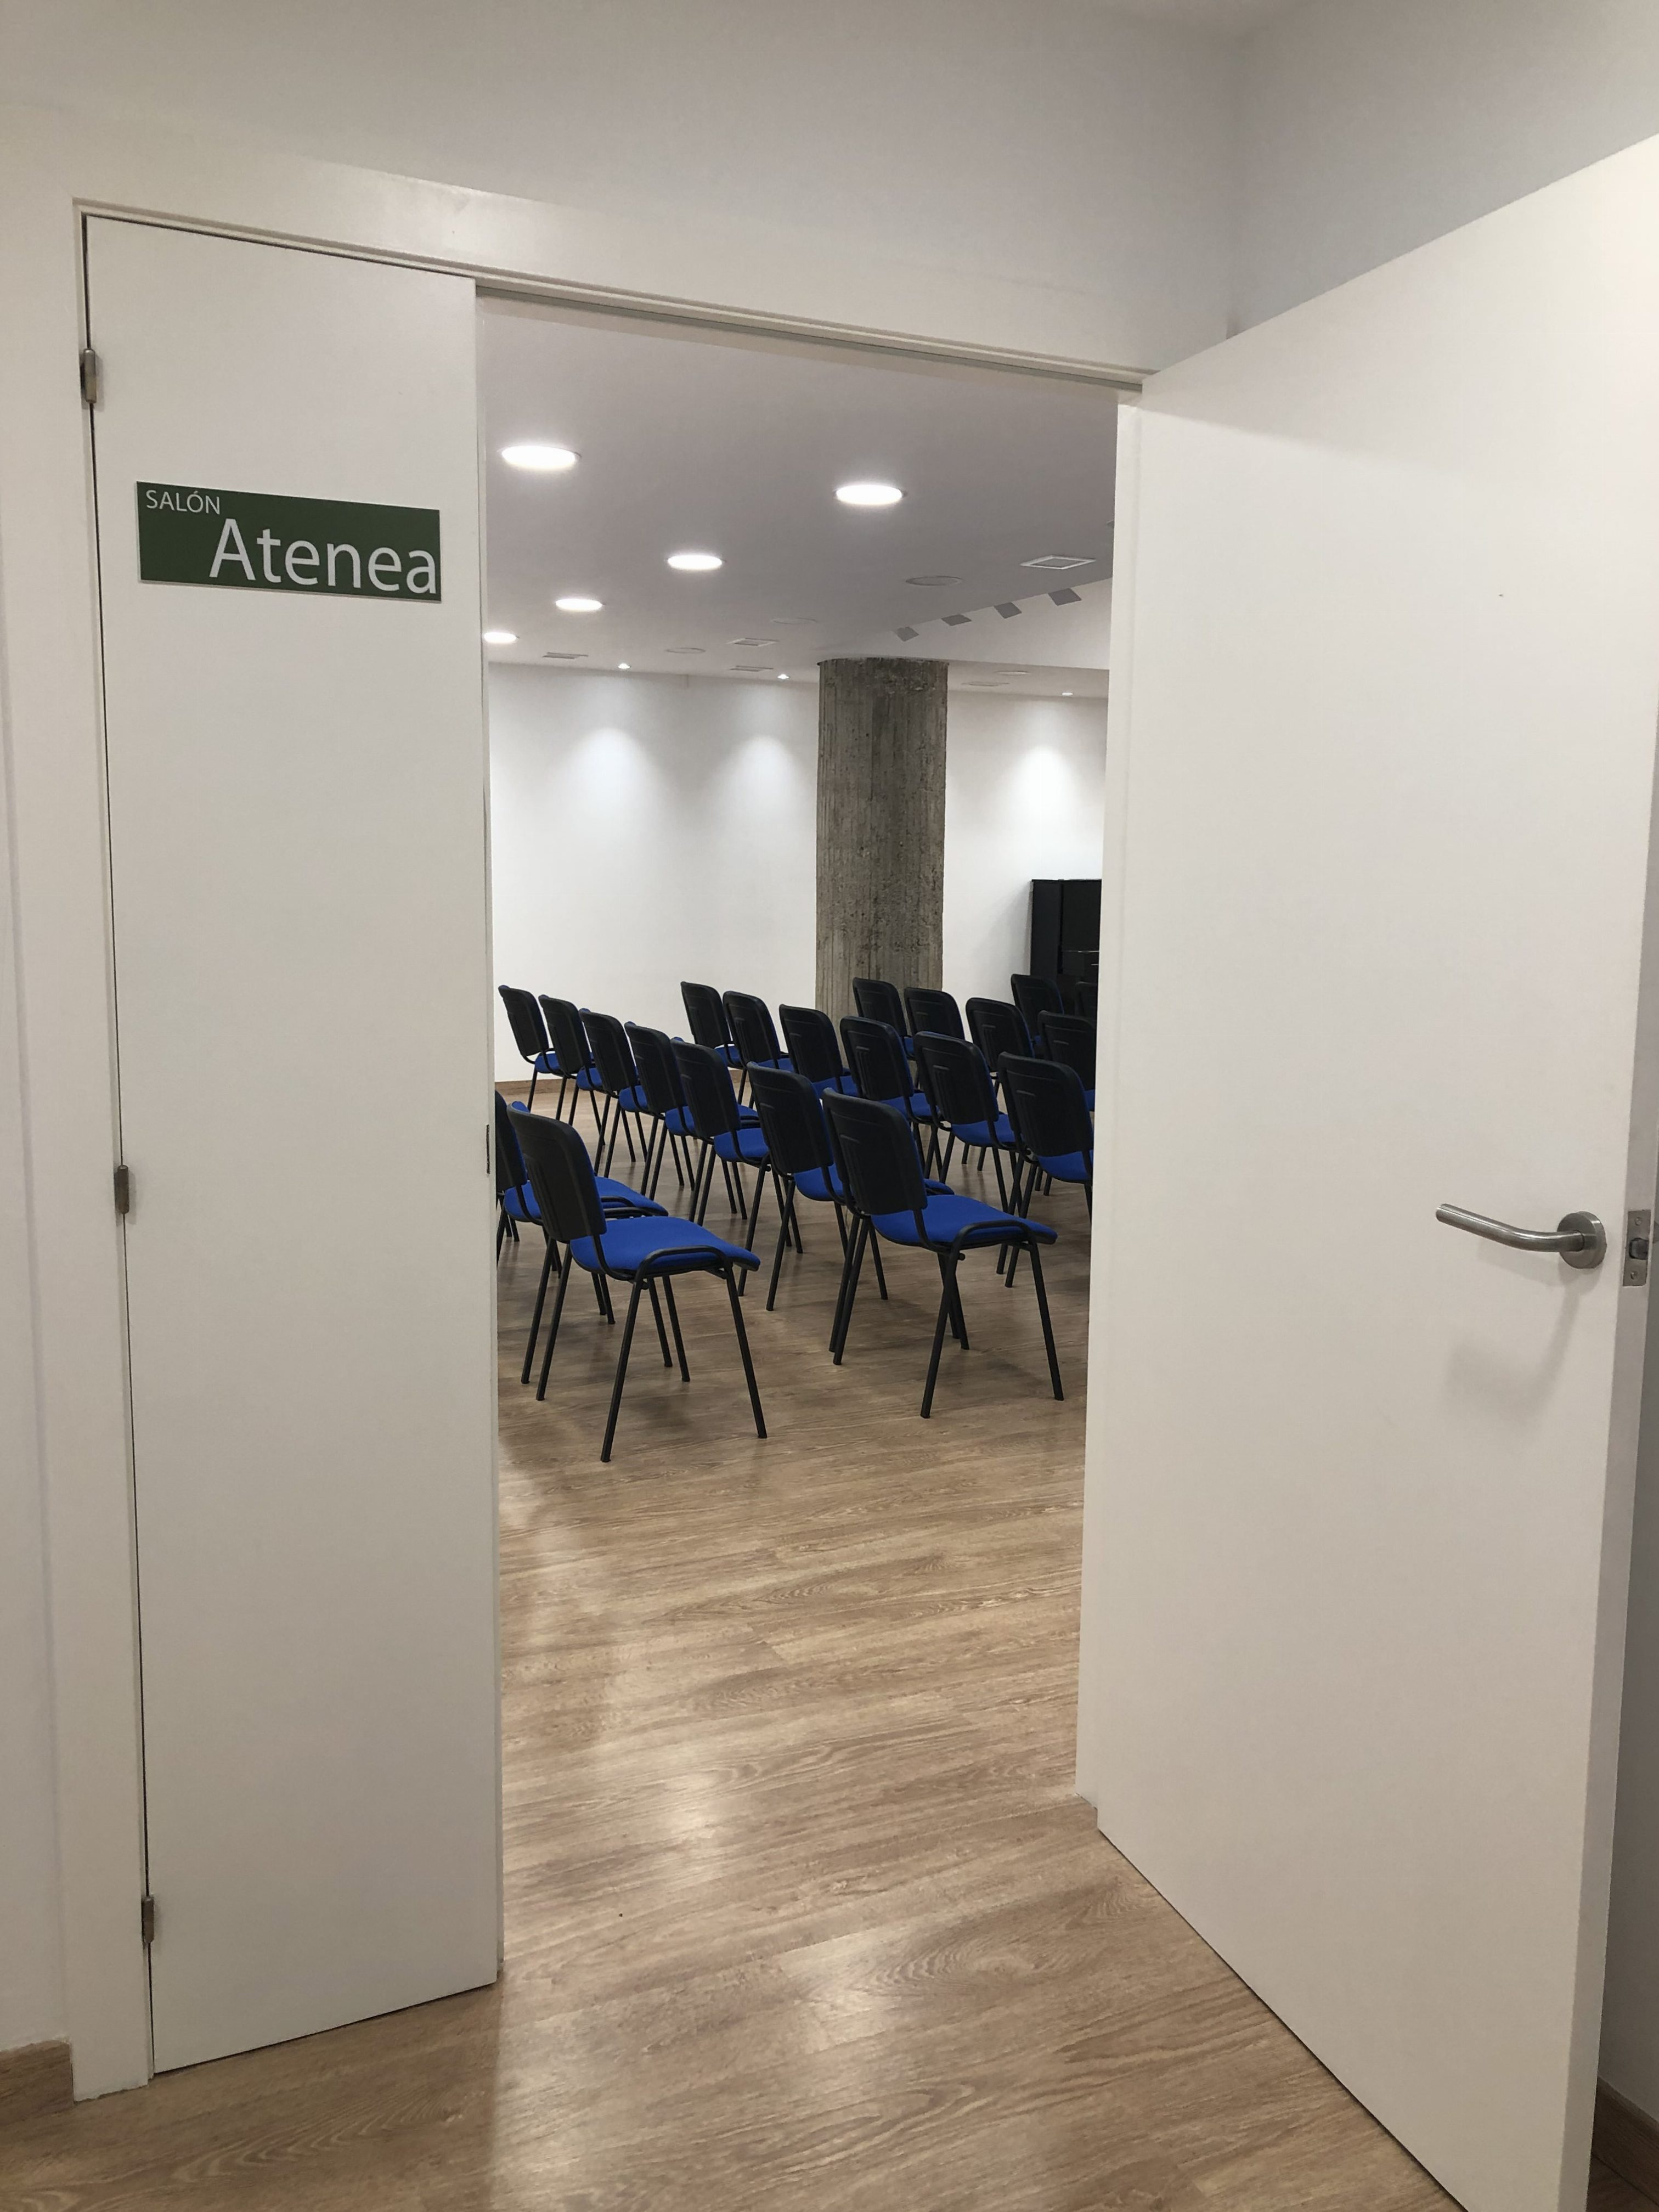 Alquiler Aulas Barcelona1